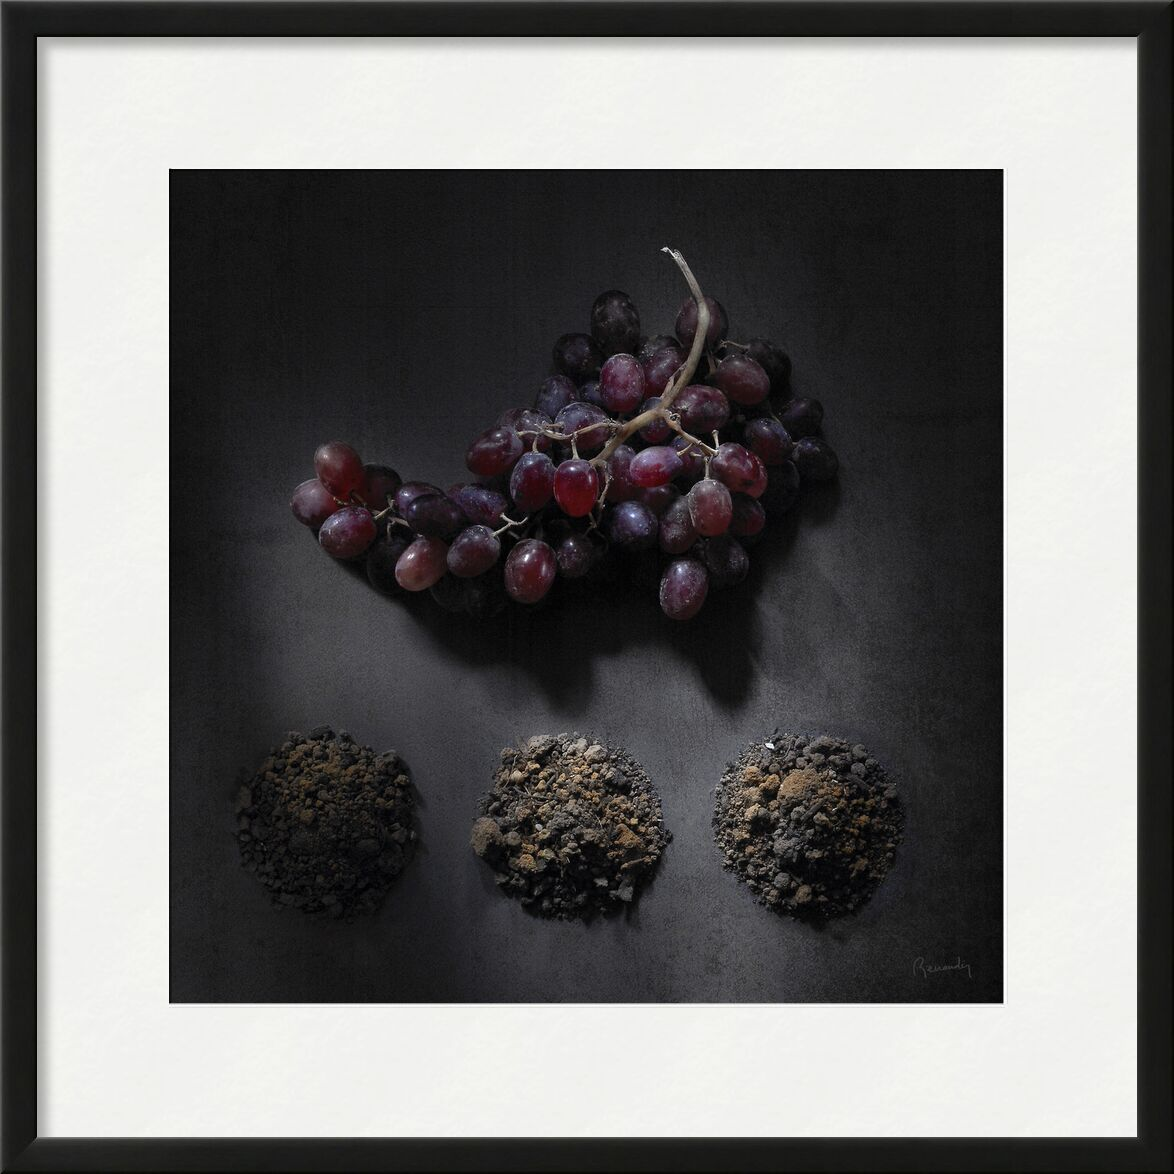 Objectif TERRE !  #11 de jean michel RENAUDIN, Prodi Art, terres, humus, fruits, des légumes, transformation, compost, terre végétale, Sol, des légumes, En traitement, terre végétale, terres arables